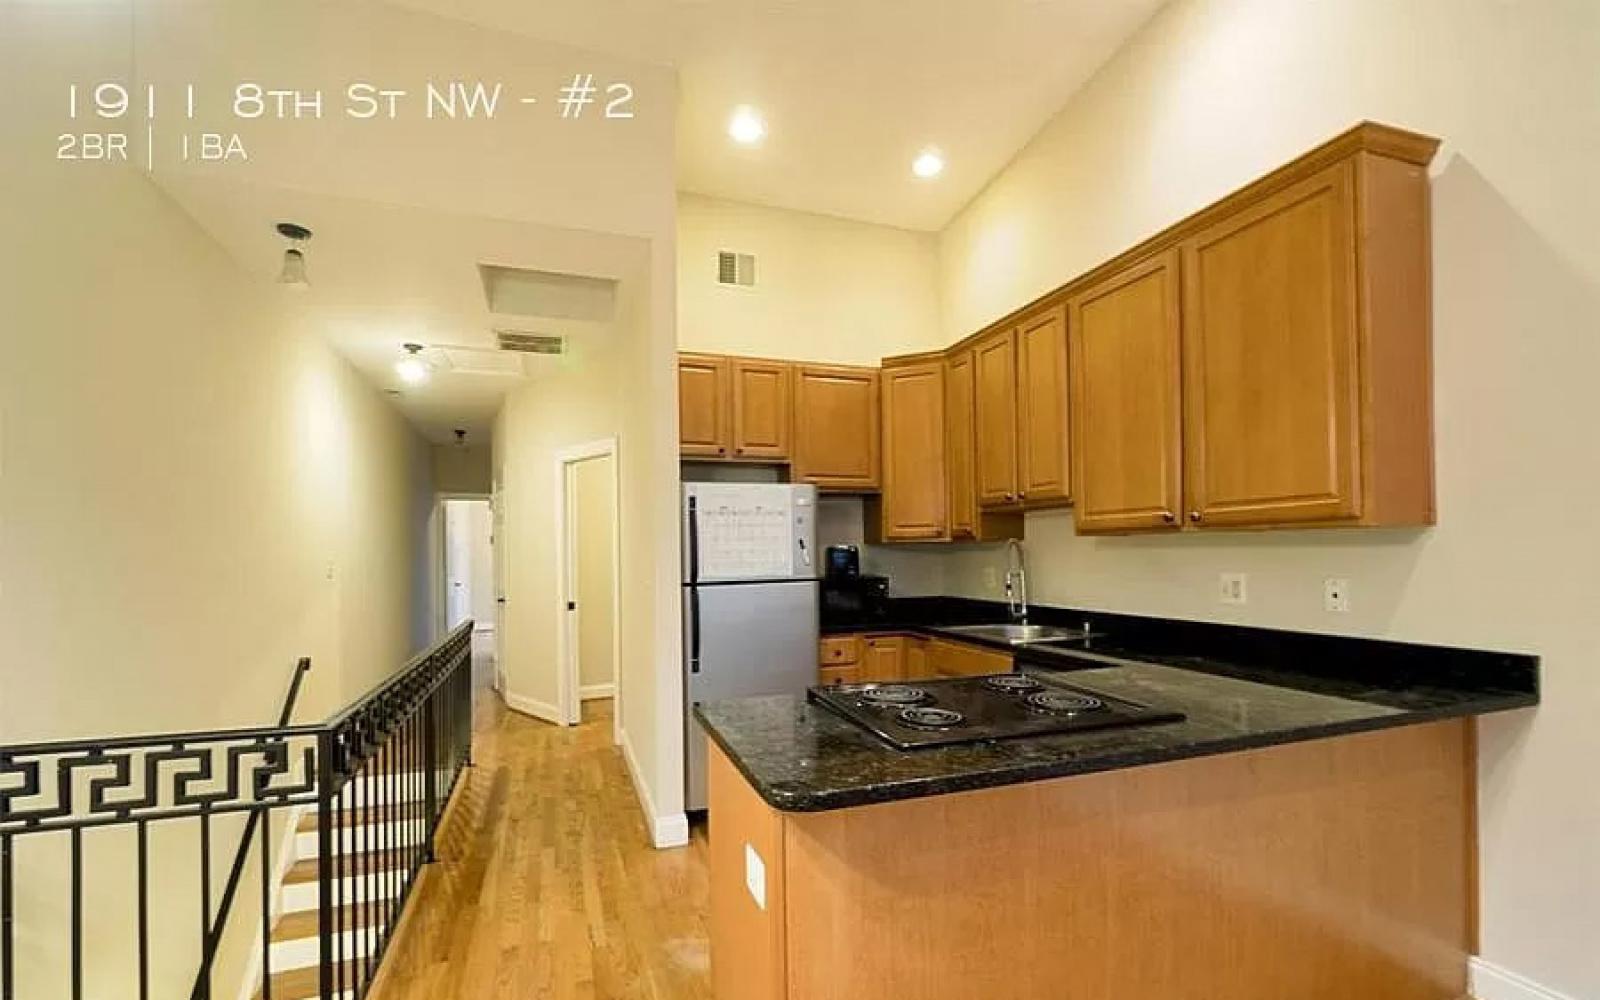 1911 8th St NW,Washington,District Of Columbia 20001,2 Bedrooms Bedrooms,1 BathroomBathrooms,Condo,8th St,1271